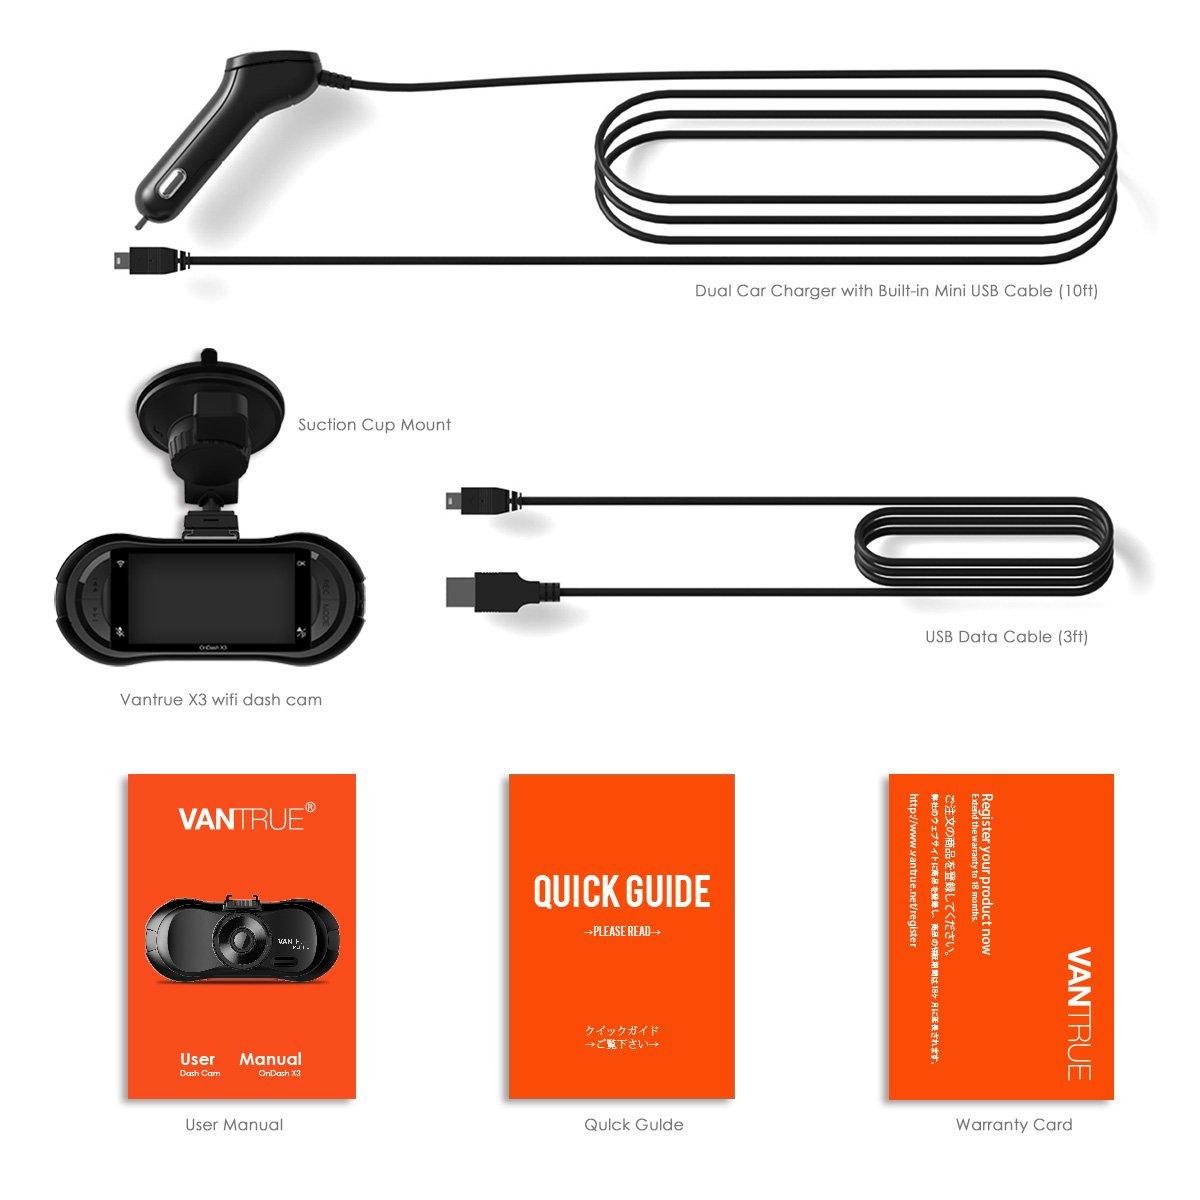 Vantrue X3 WIFI Dash Cam, Super HD 2.5K Car Dashboard Camera 1440P Car Camera with Ambarella A12 Chipset, 170°Wide Angle, Super HDR Night Vision, Loop Recording, Parking Mode, Motion Detection by VANTRUE (Image #8)